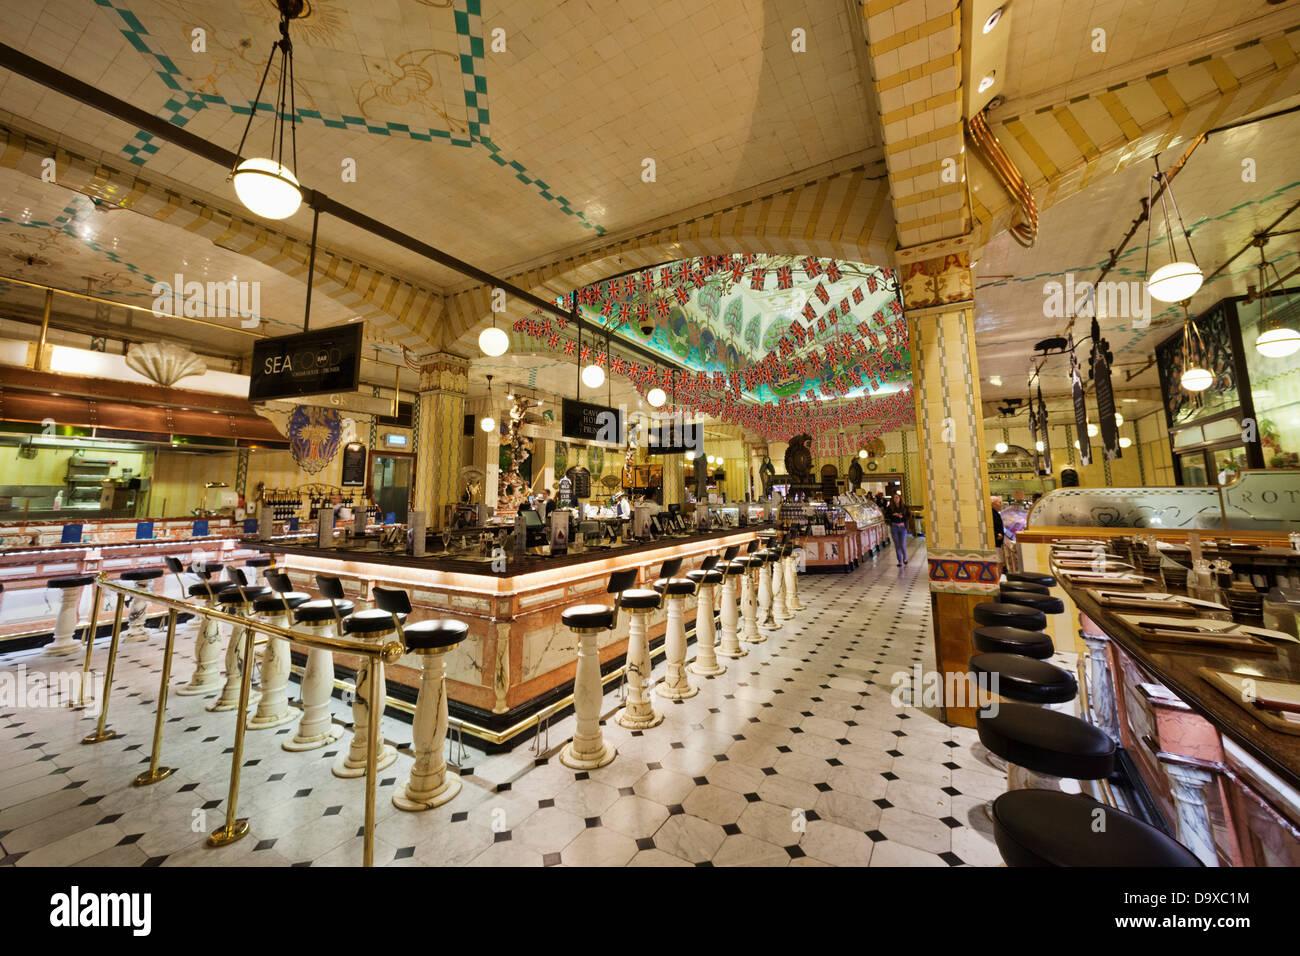 gro britannien england london knightsbridge harrods foodhall restaurants stockfoto bild. Black Bedroom Furniture Sets. Home Design Ideas